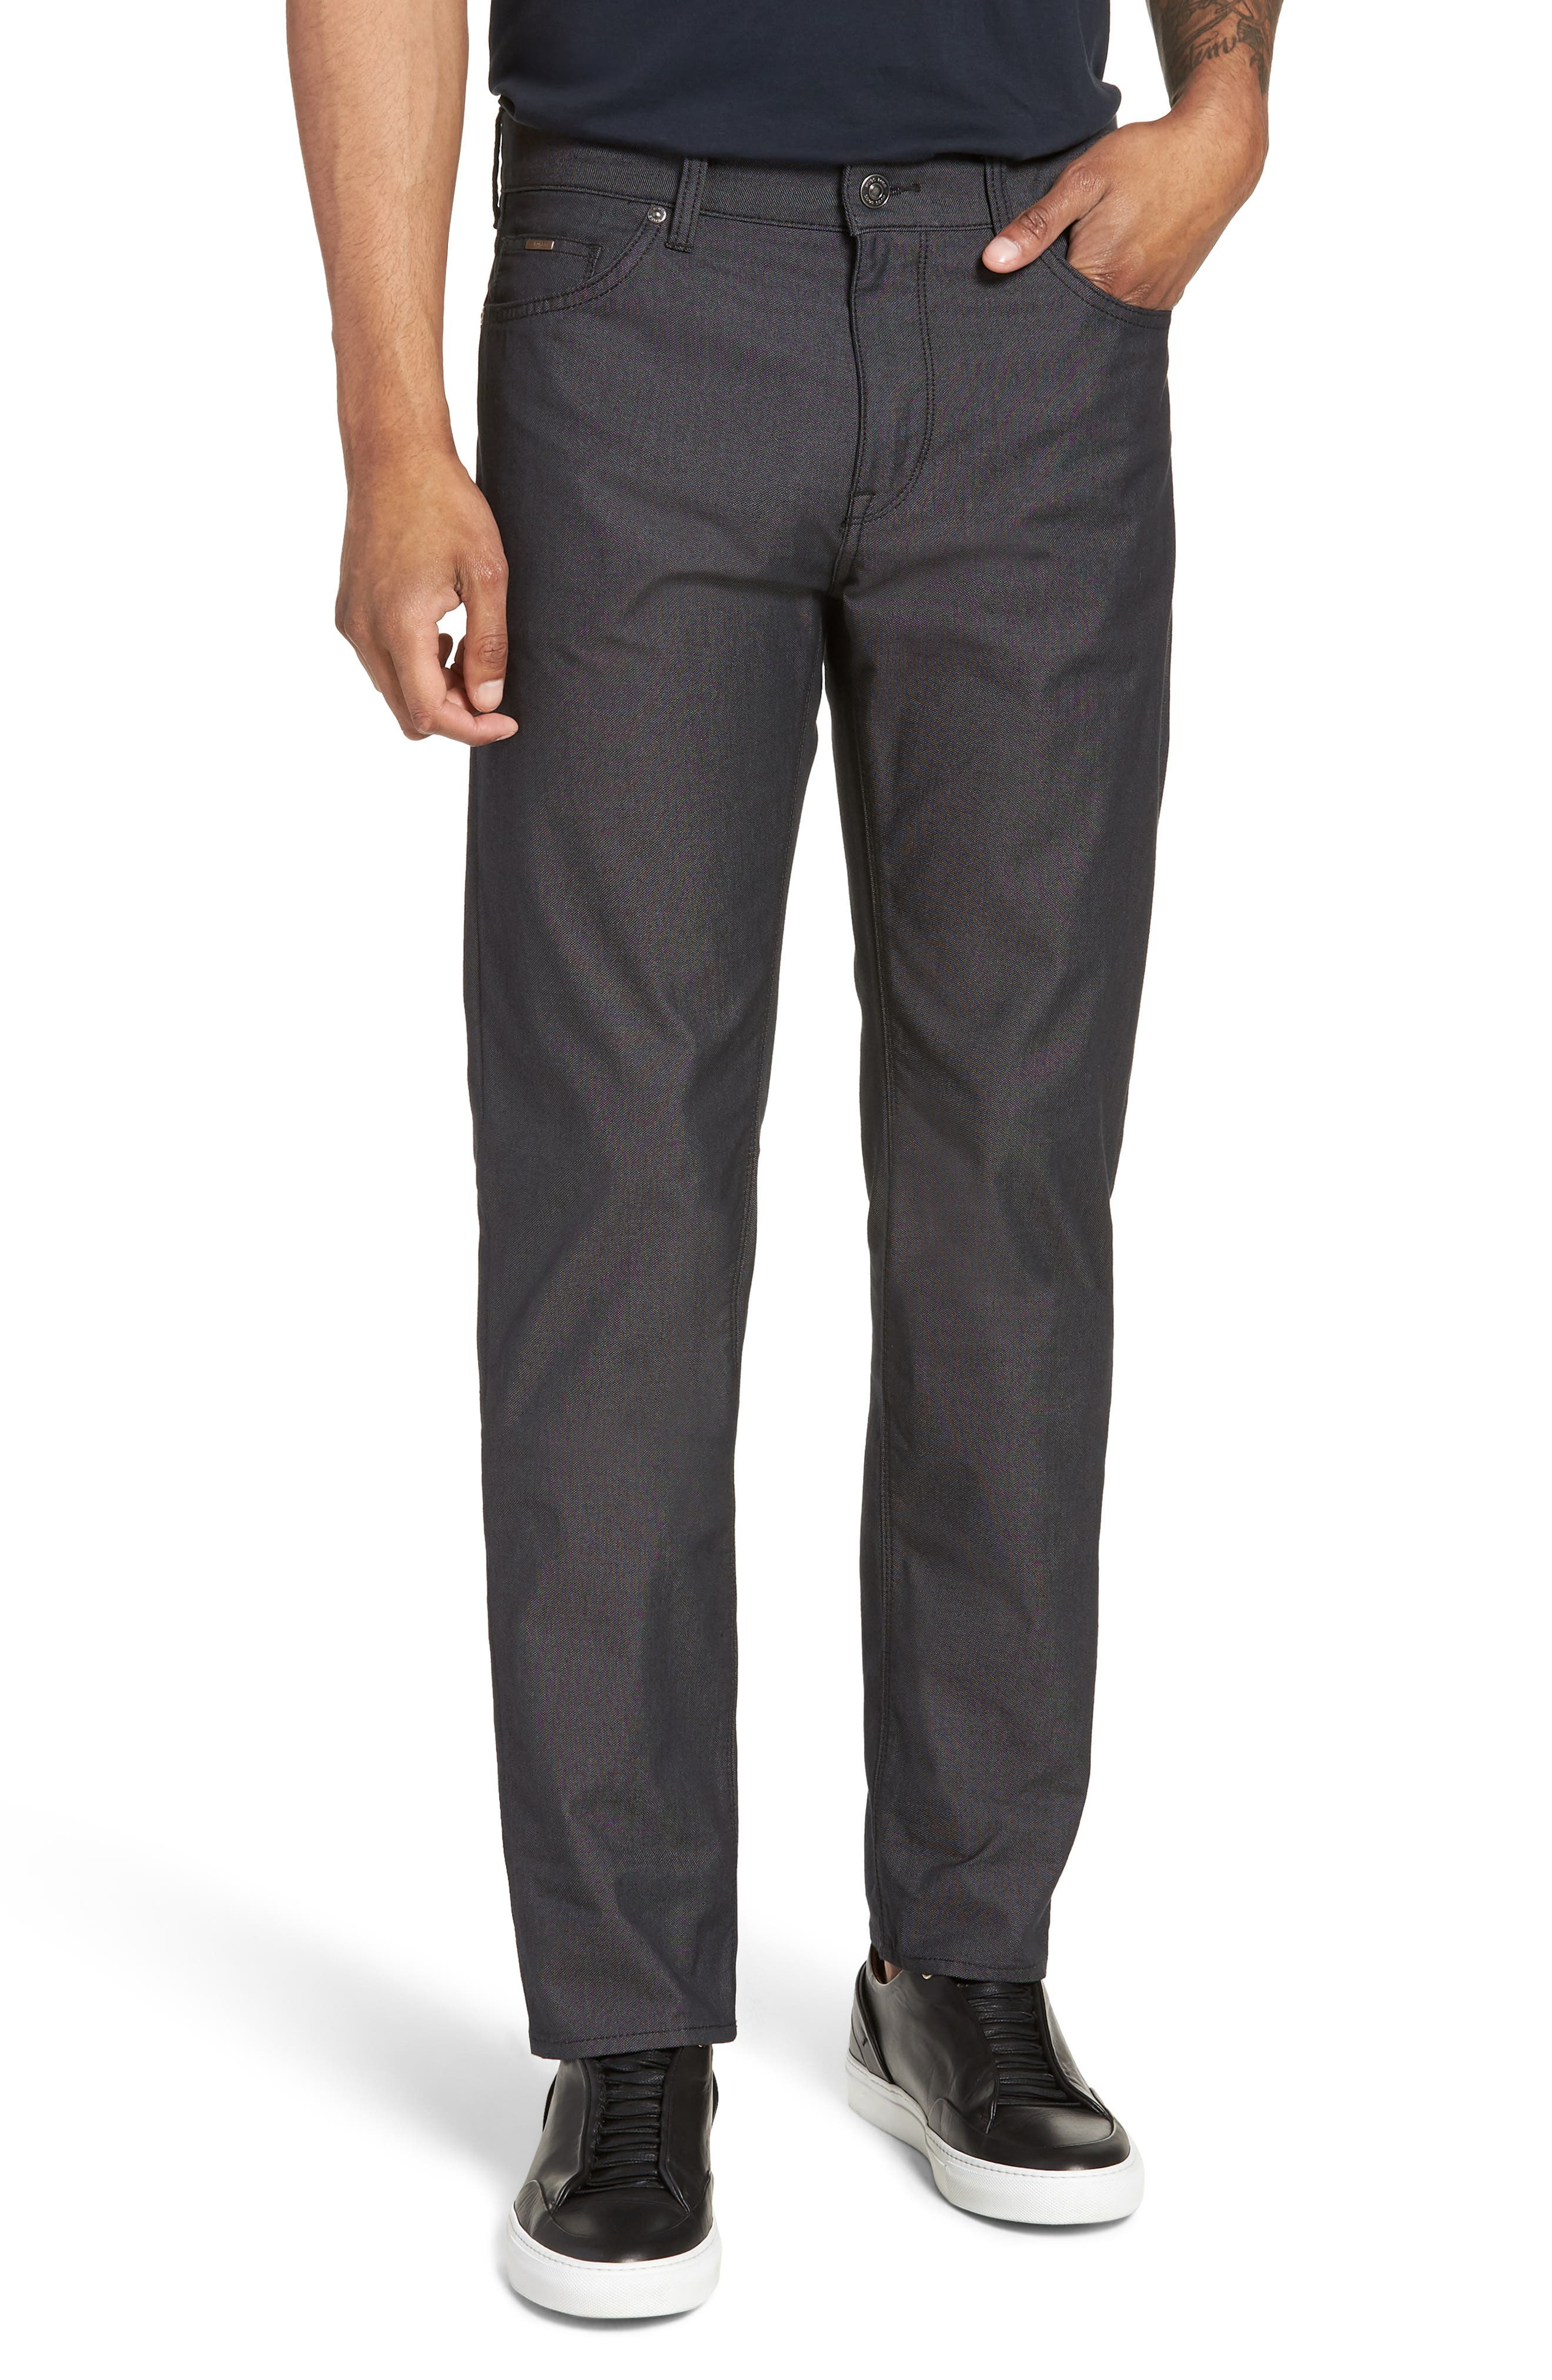 Maine Straight Leg Jeans,                             Main thumbnail 1, color,                             001